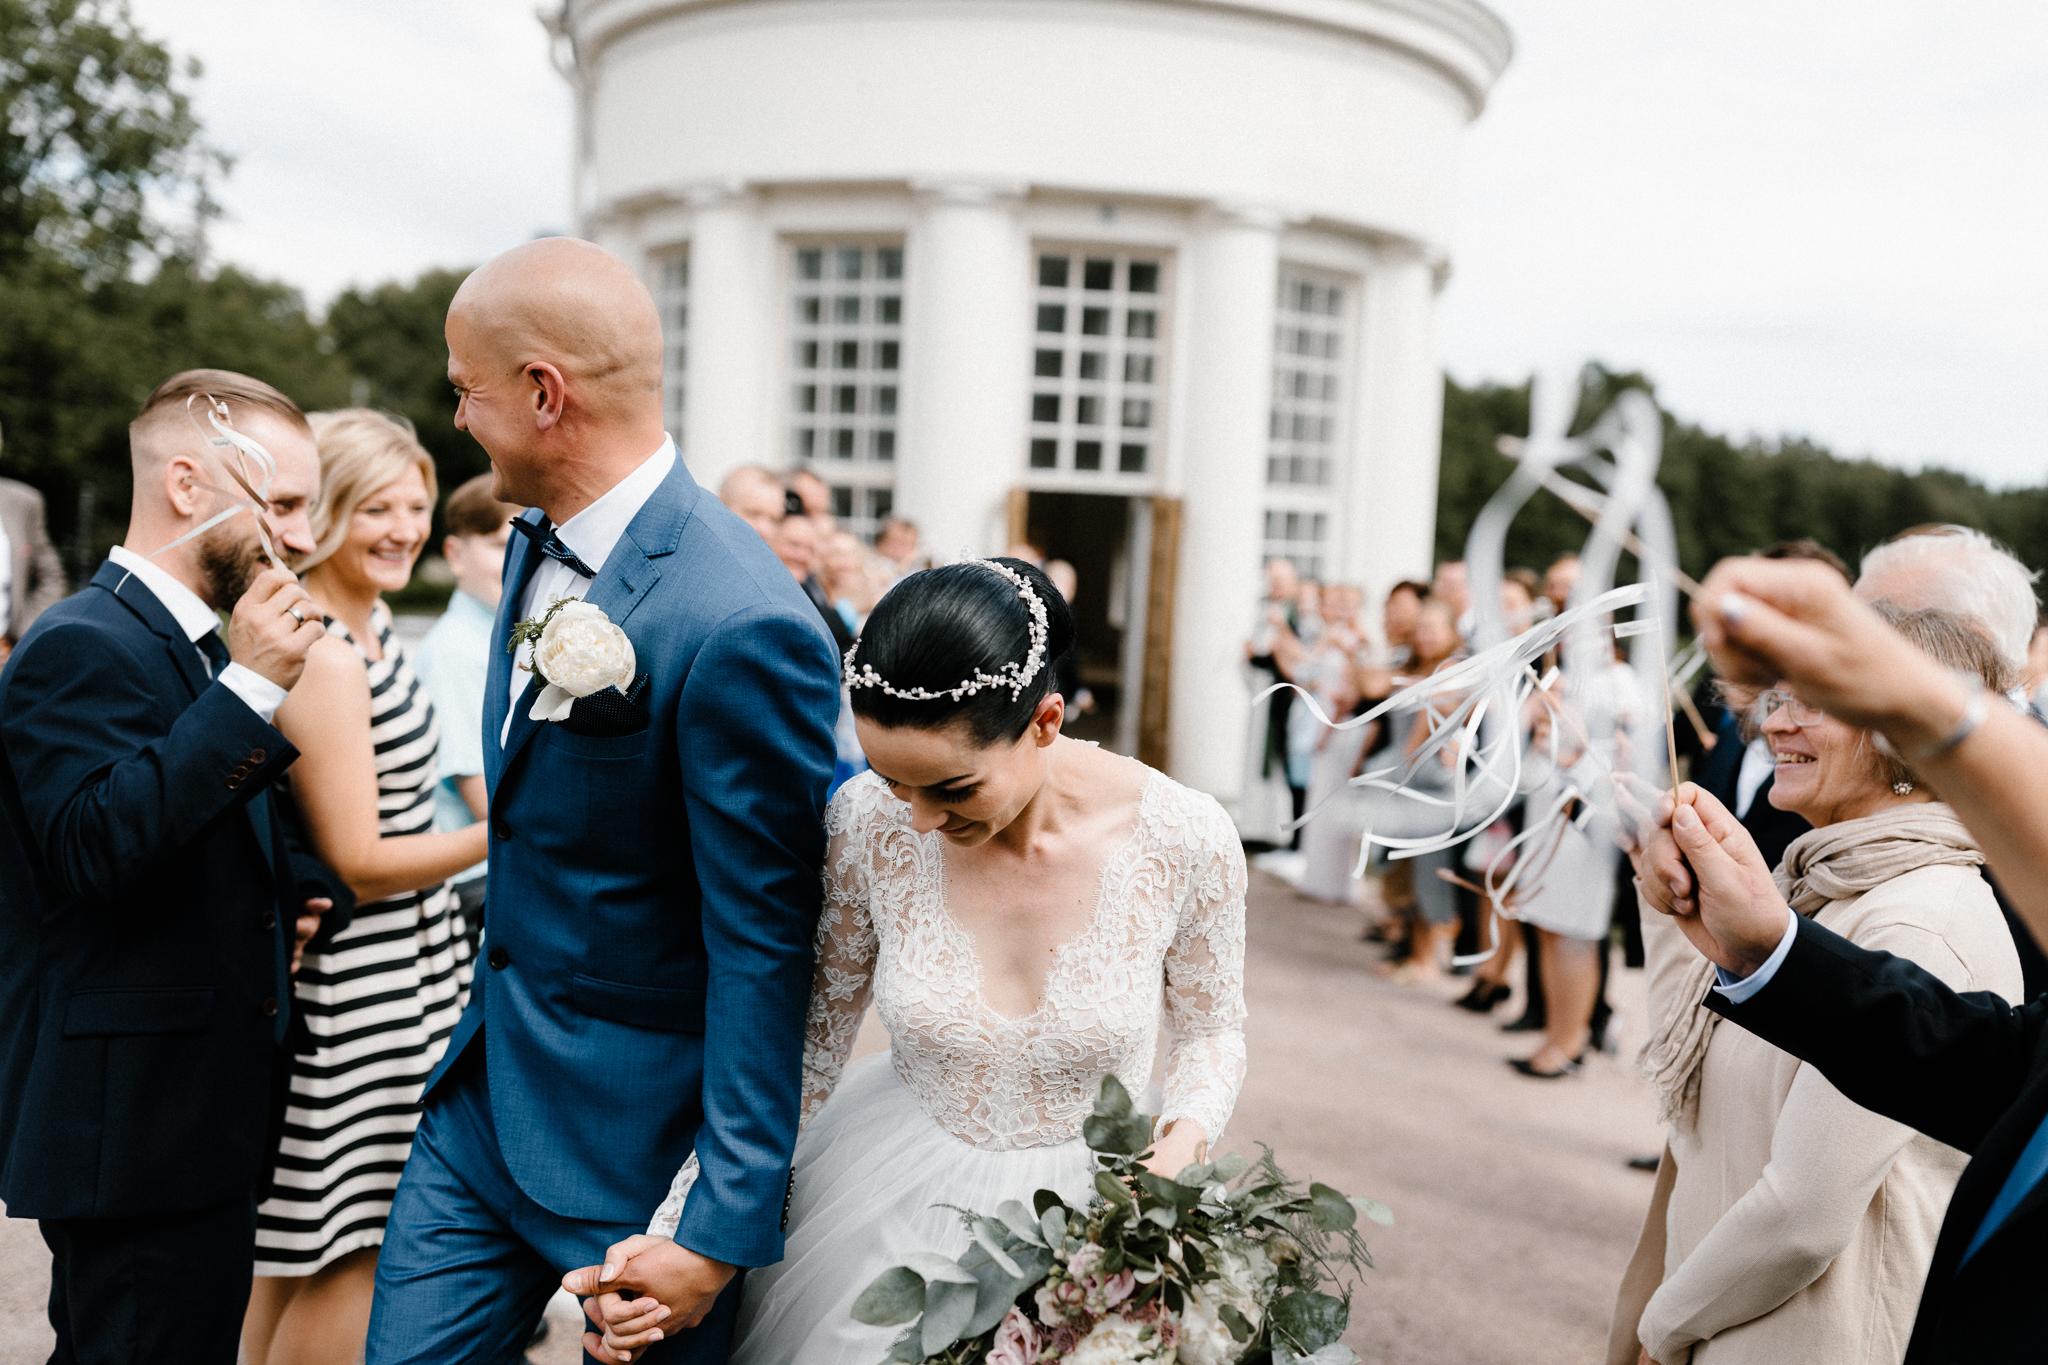 Essi + Ville   Oitbacka Gården   by Patrick Karkkolainen Wedding Photography-171.jpg